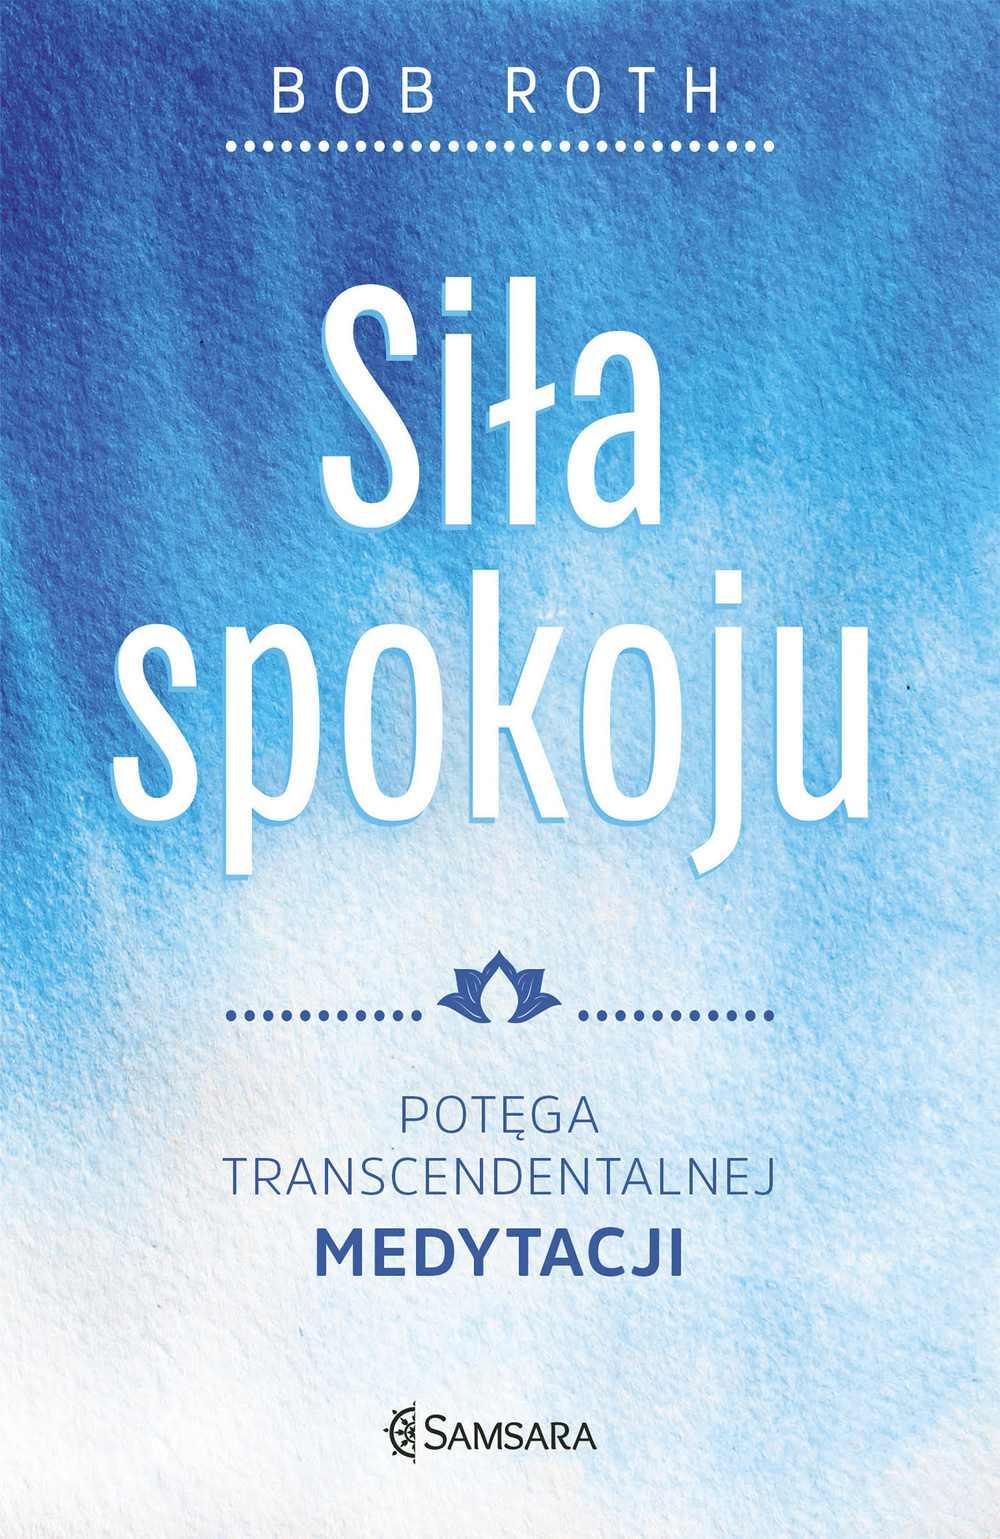 Siła spokoju. Potęga Transcendentalnej Medytacji - Ebook (Książka EPUB) do pobrania w formacie EPUB